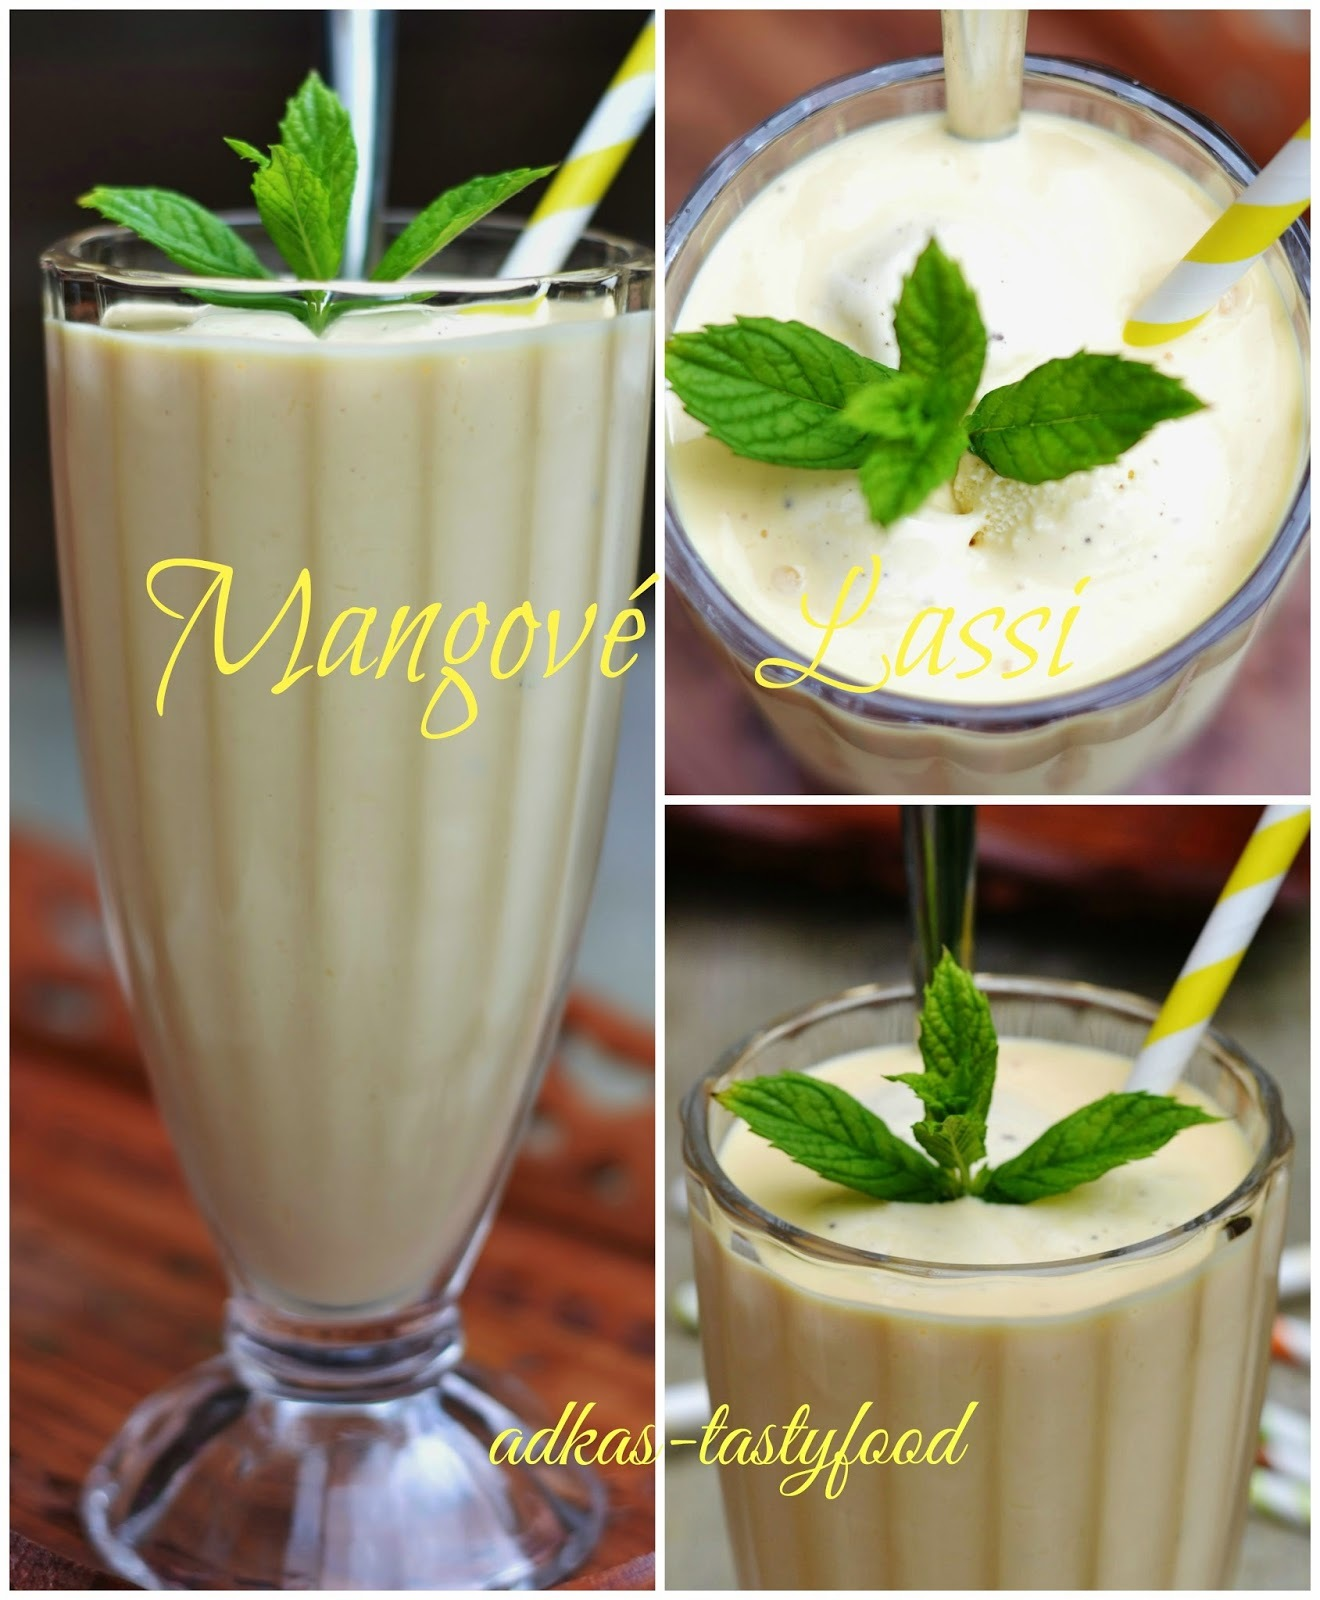 Mangové Lassi